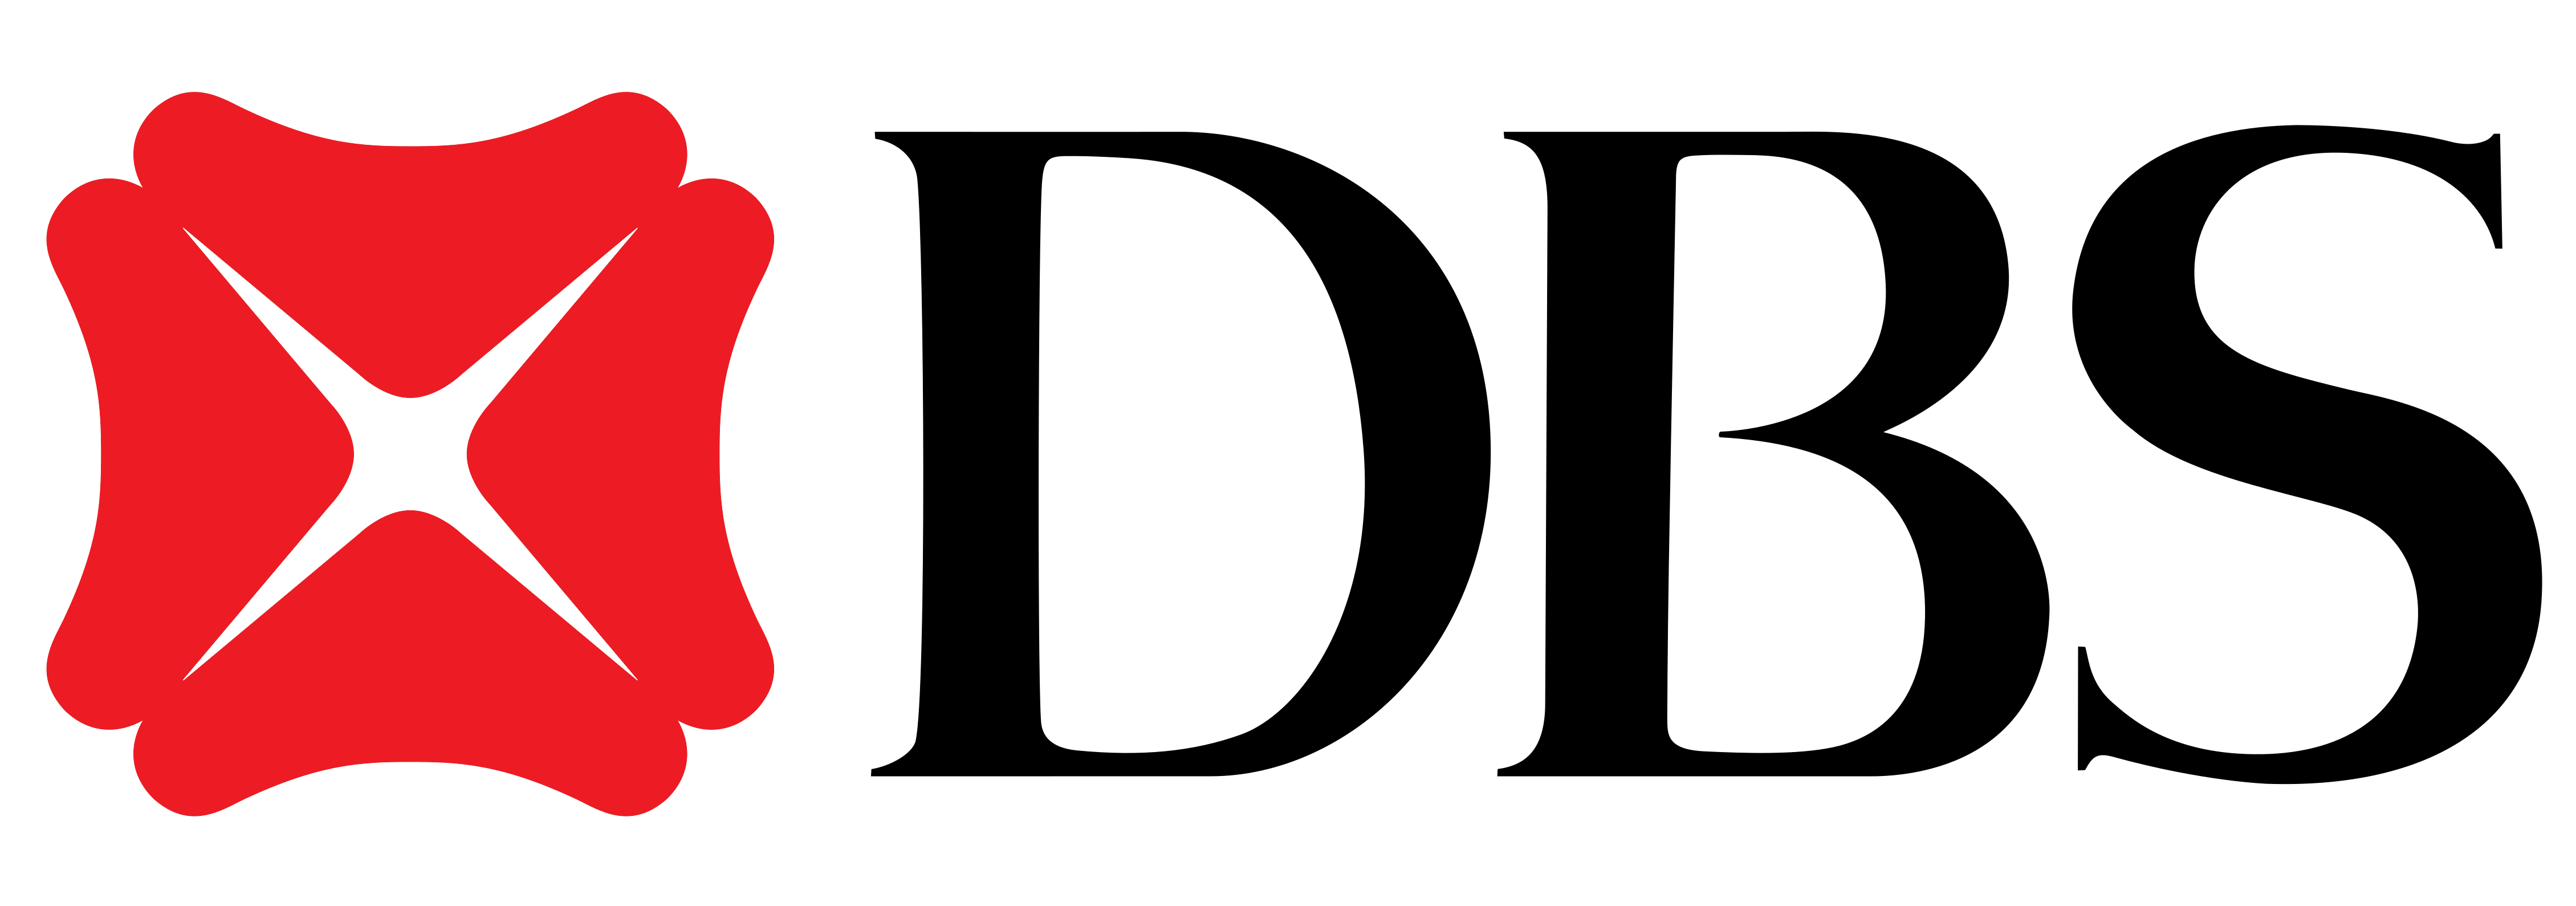 DBS Bank - Dbs Logo Vector PNG